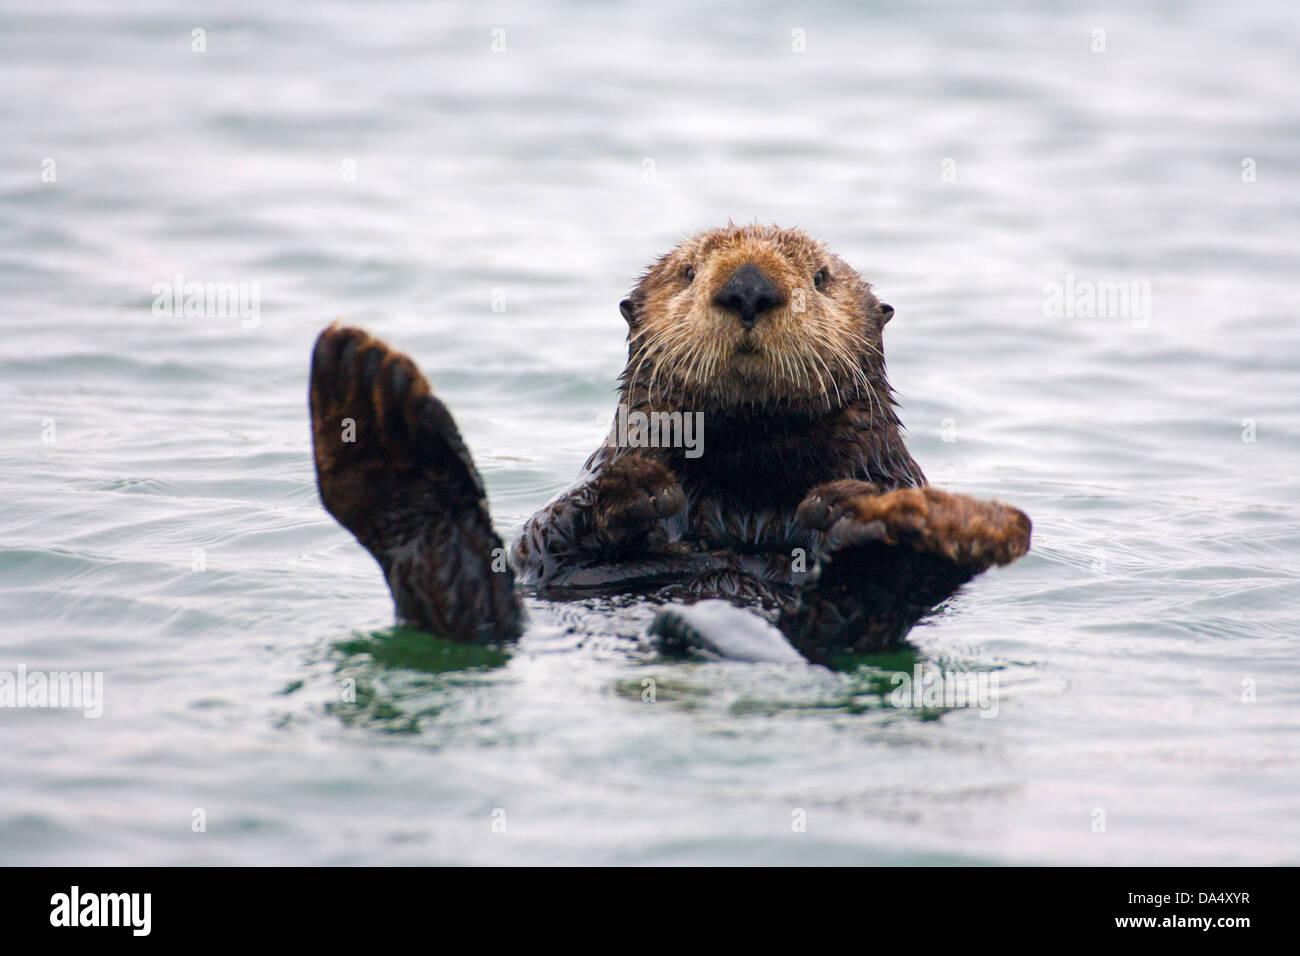 Sea Otter Enhydra lutris Monterey Bay, California, United States 24 June Adult Mustelidae - Stock Image